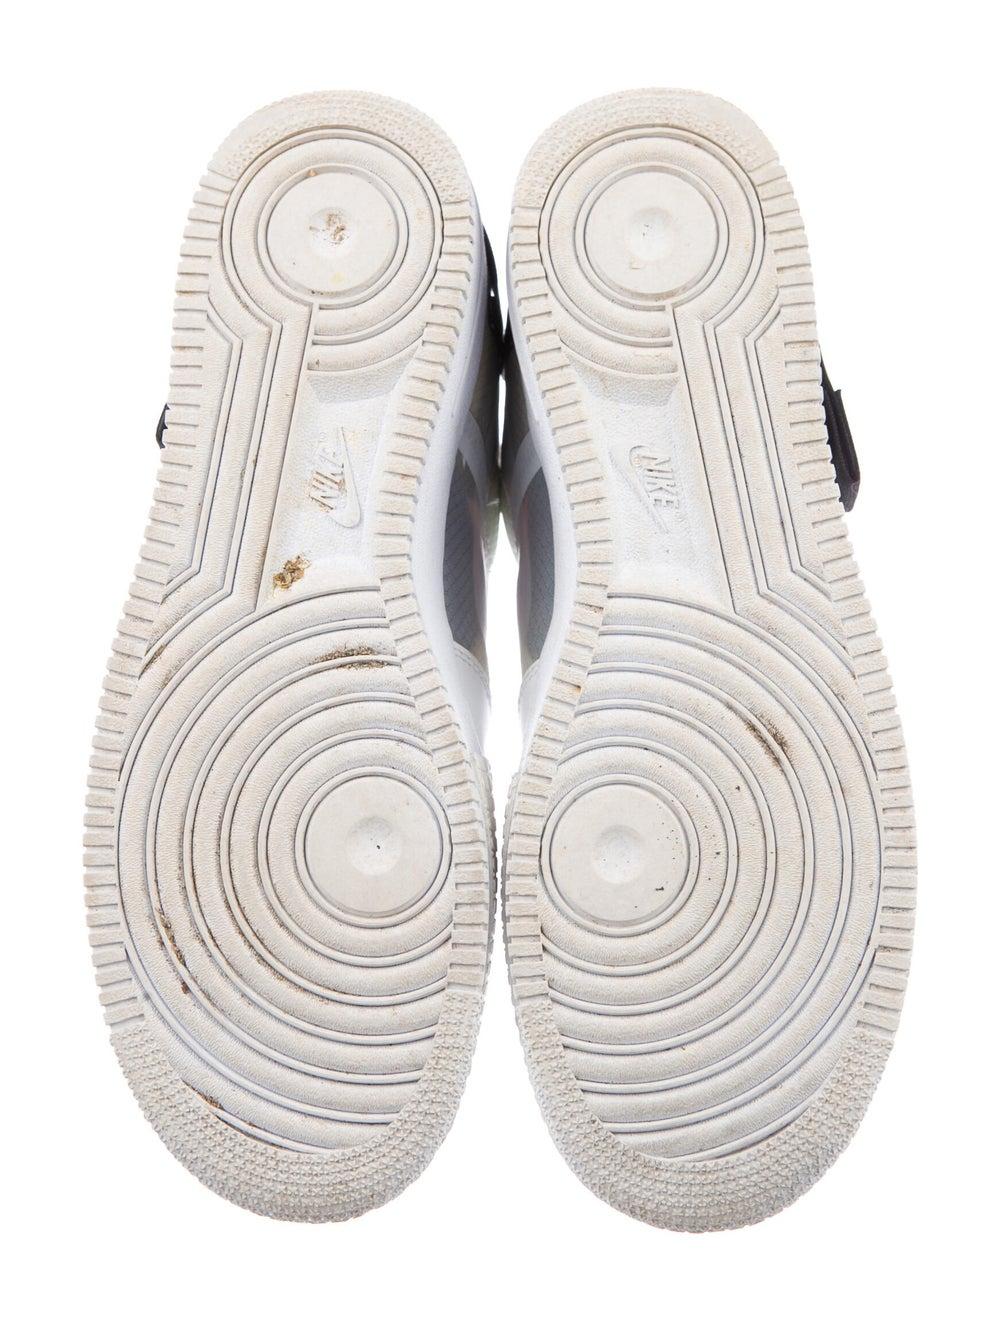 Nike Air Force 1 Type Sneakers - image 5